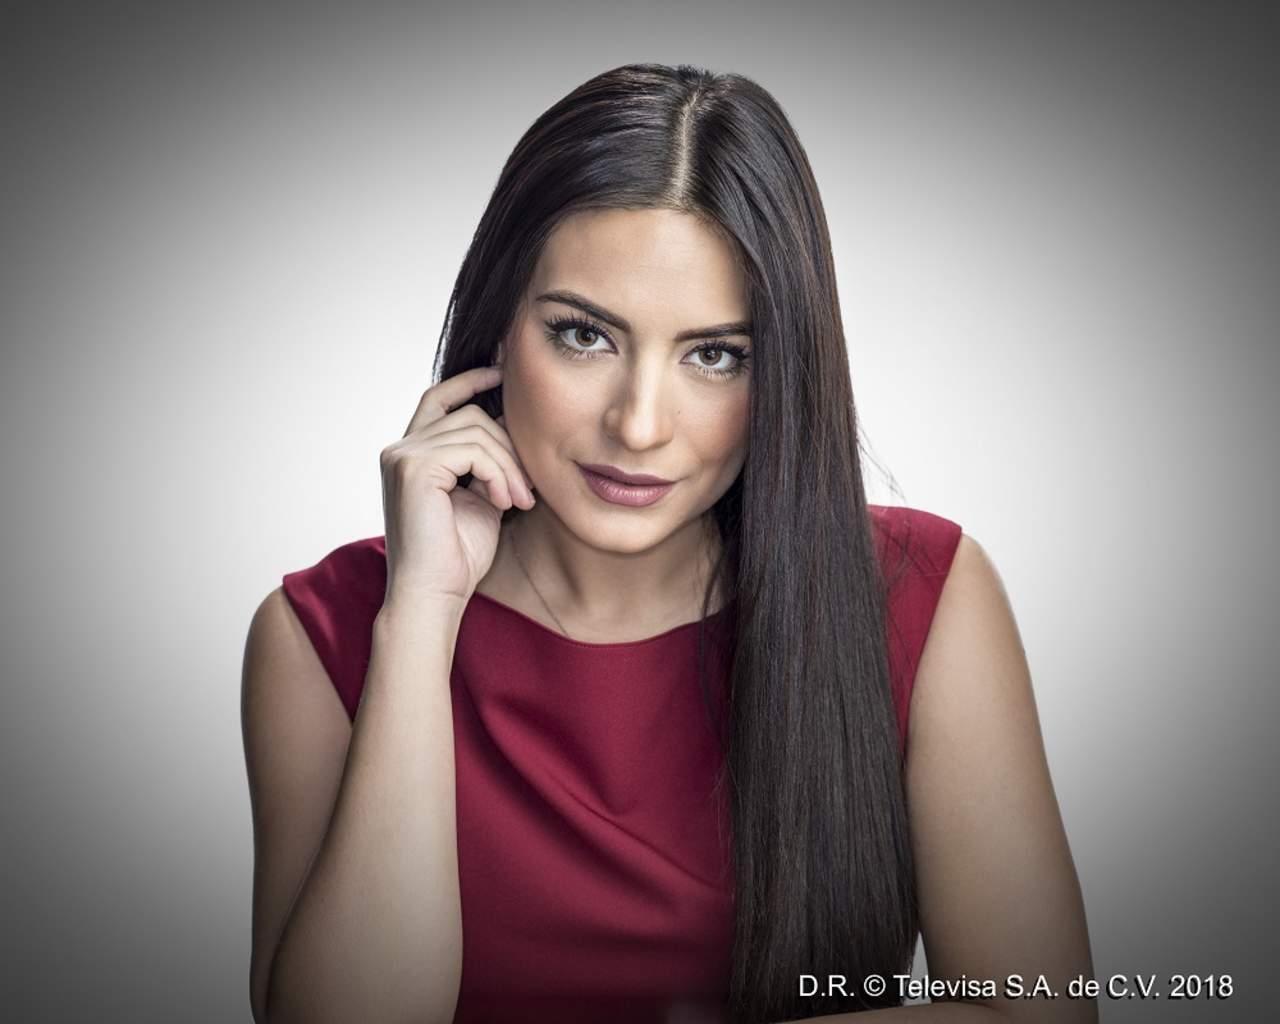 Anuncia Televisa nueva telenovela